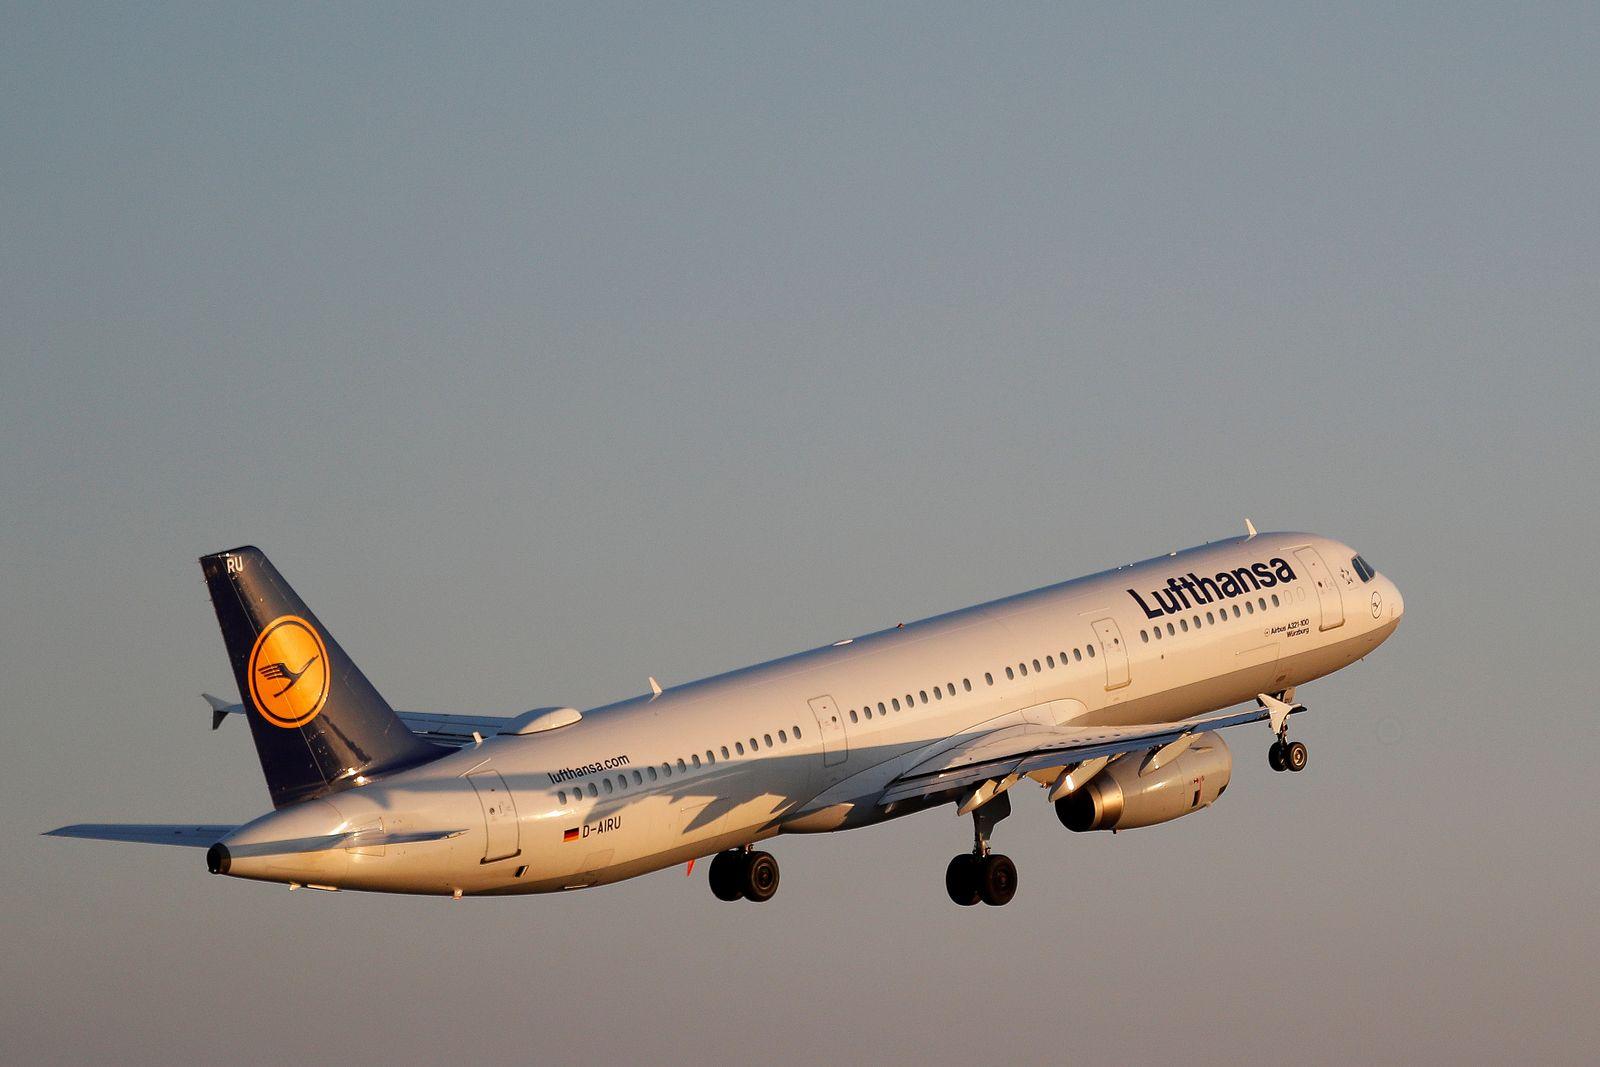 Lufthansa/ Flugzeug/ Airbus A321